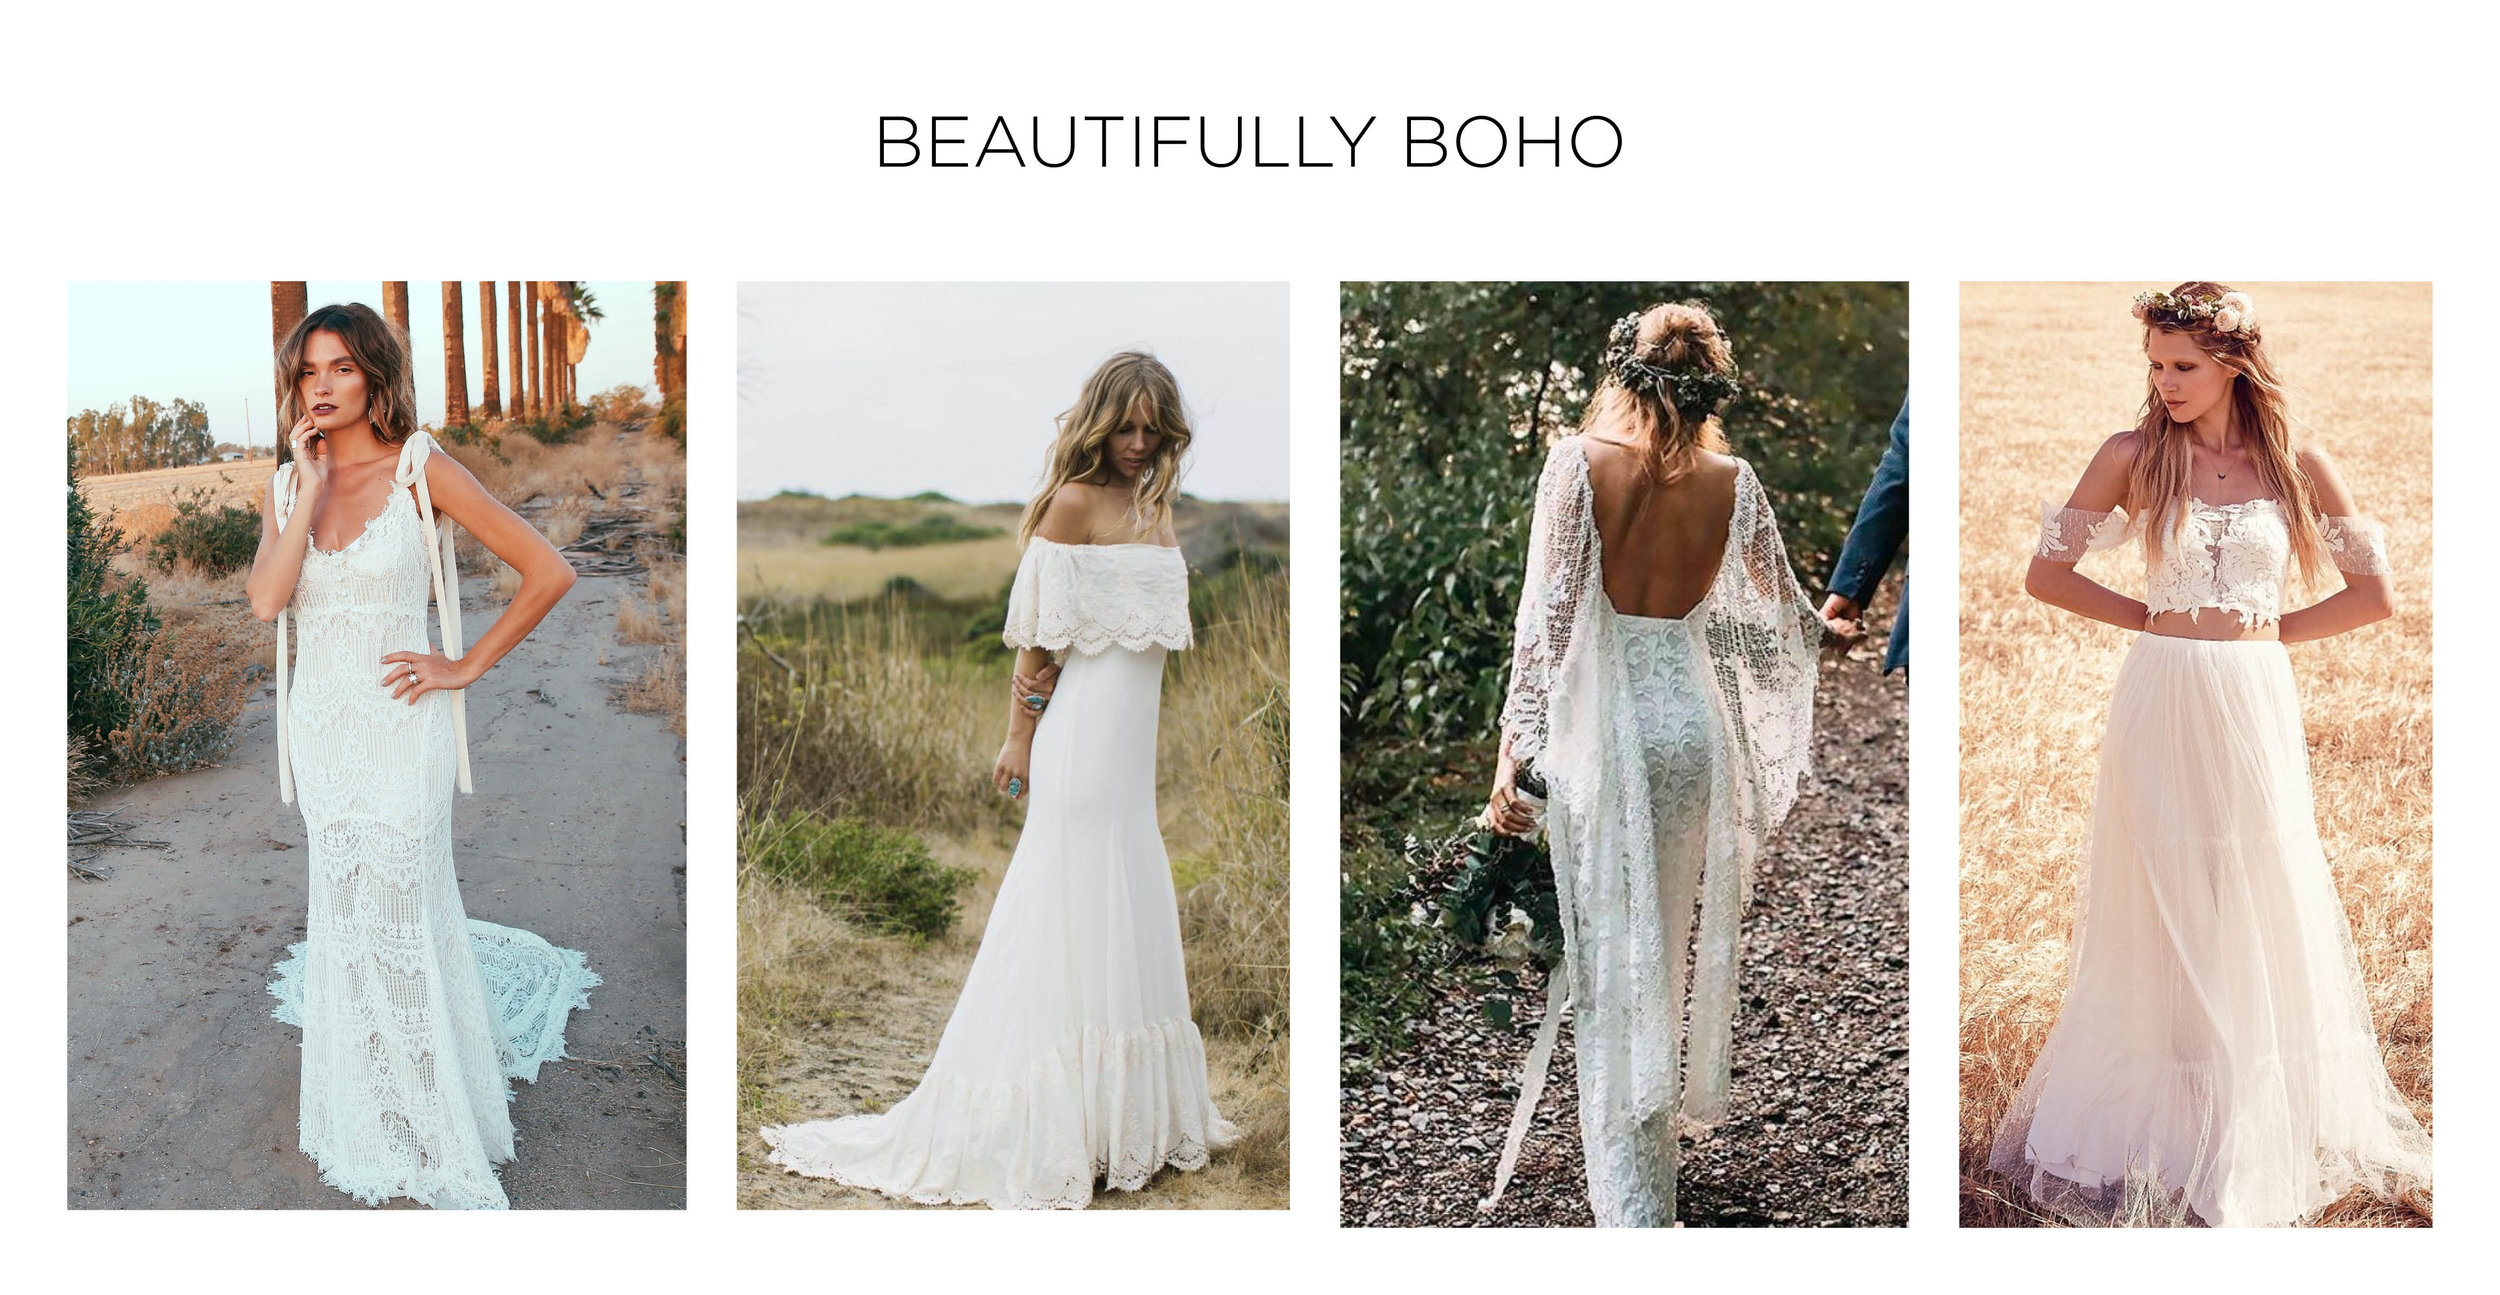 boho wedding majorca wedding planner wedding dress mallorca wedding dresses .jpg